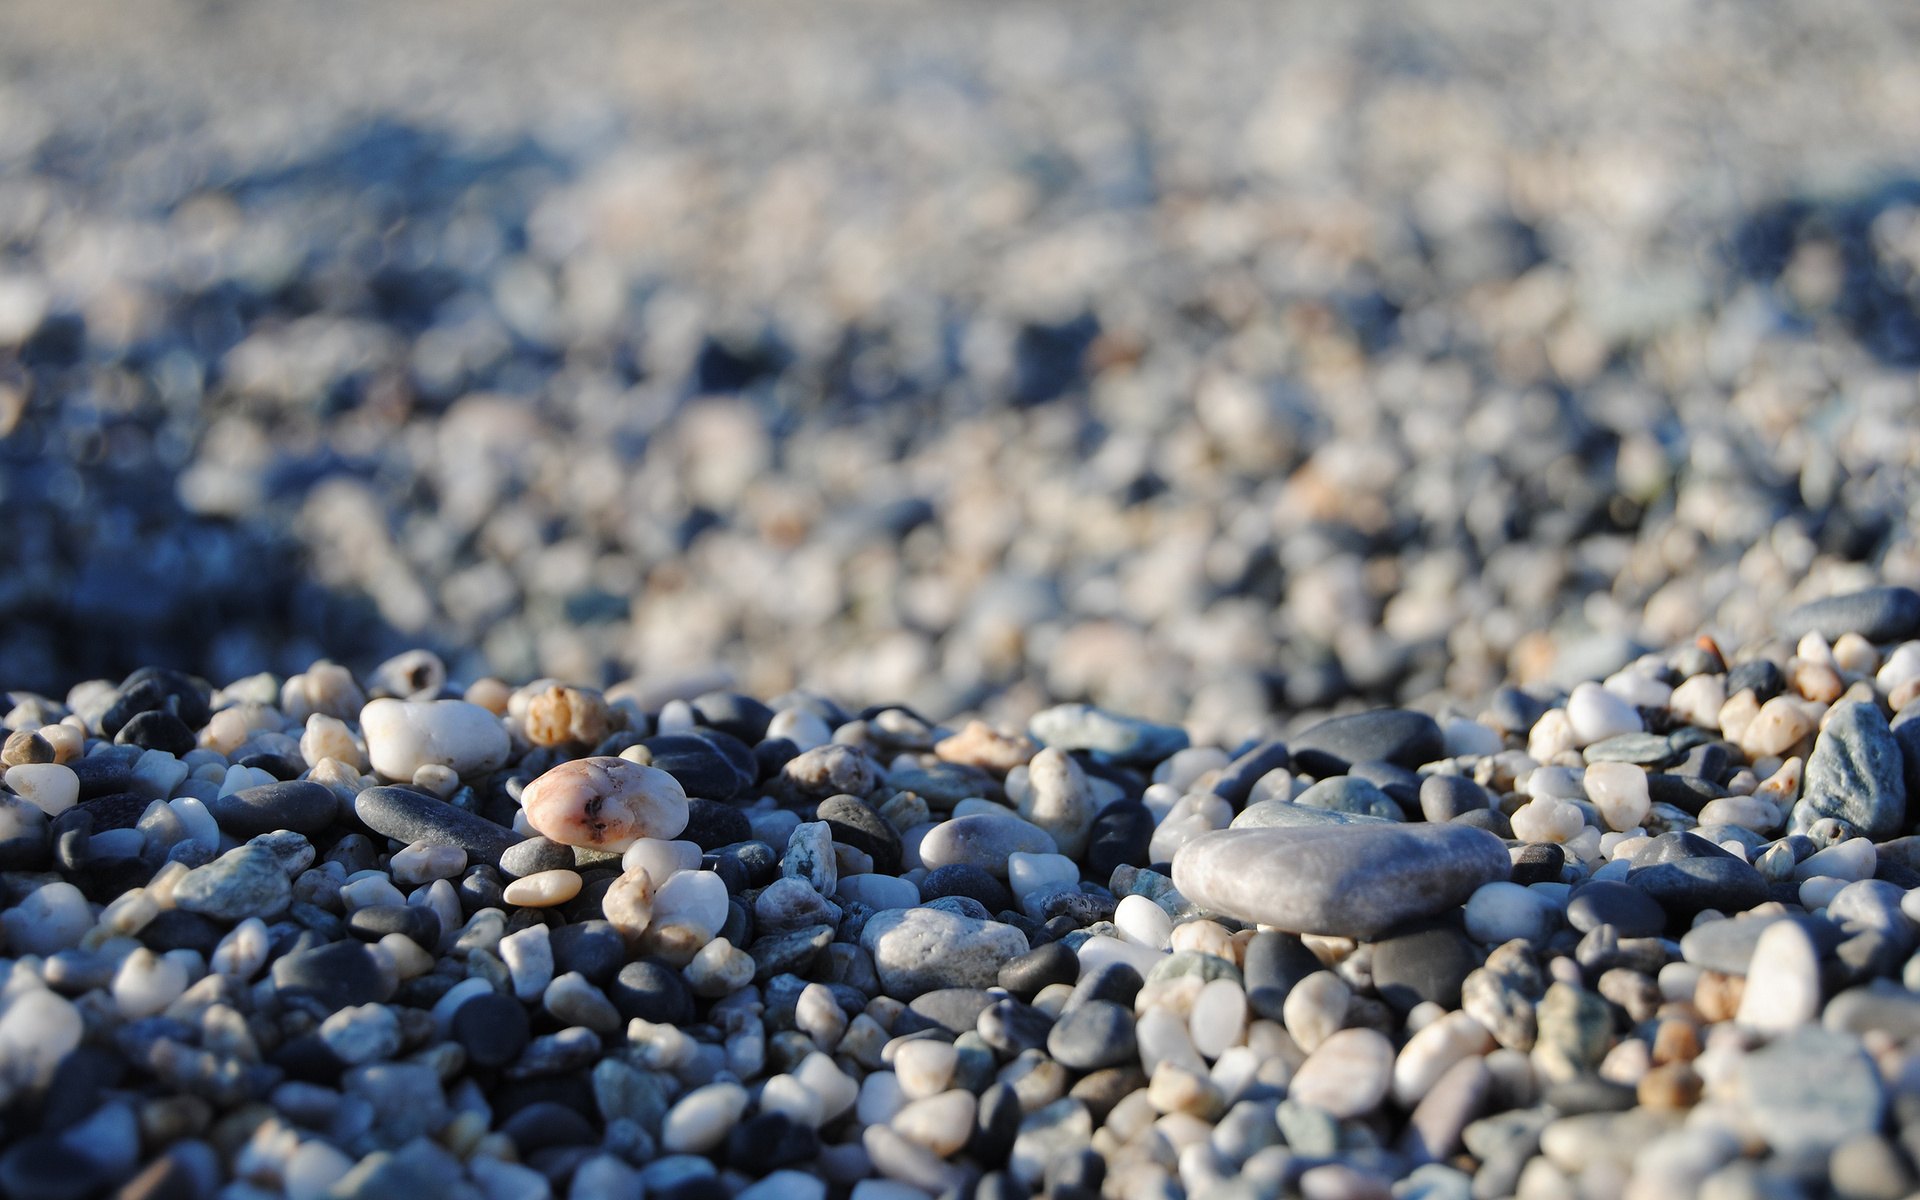 камни, камушки, мелкие